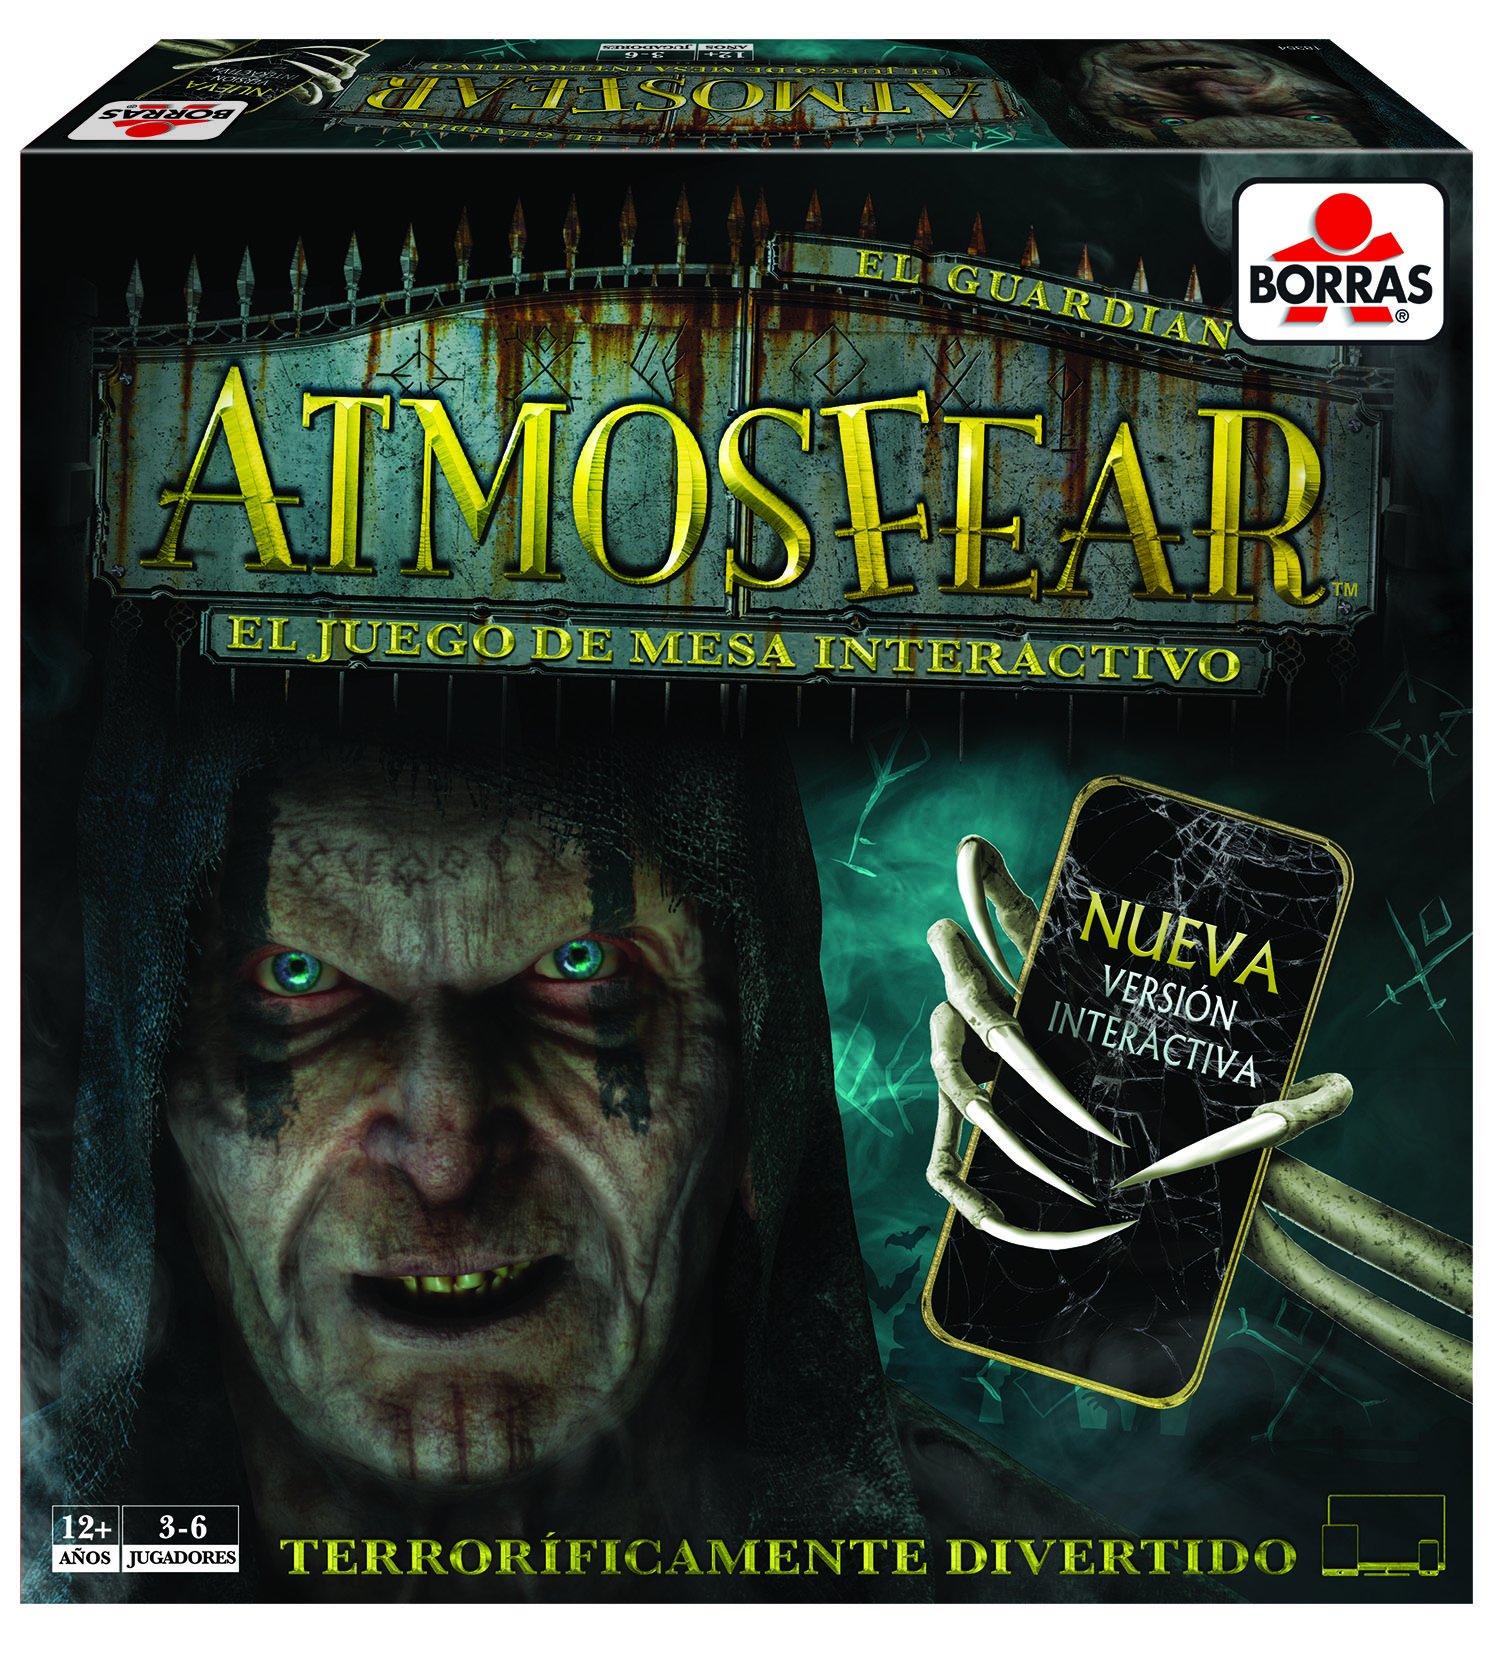 ATMOSFEAR 18354 - N58419